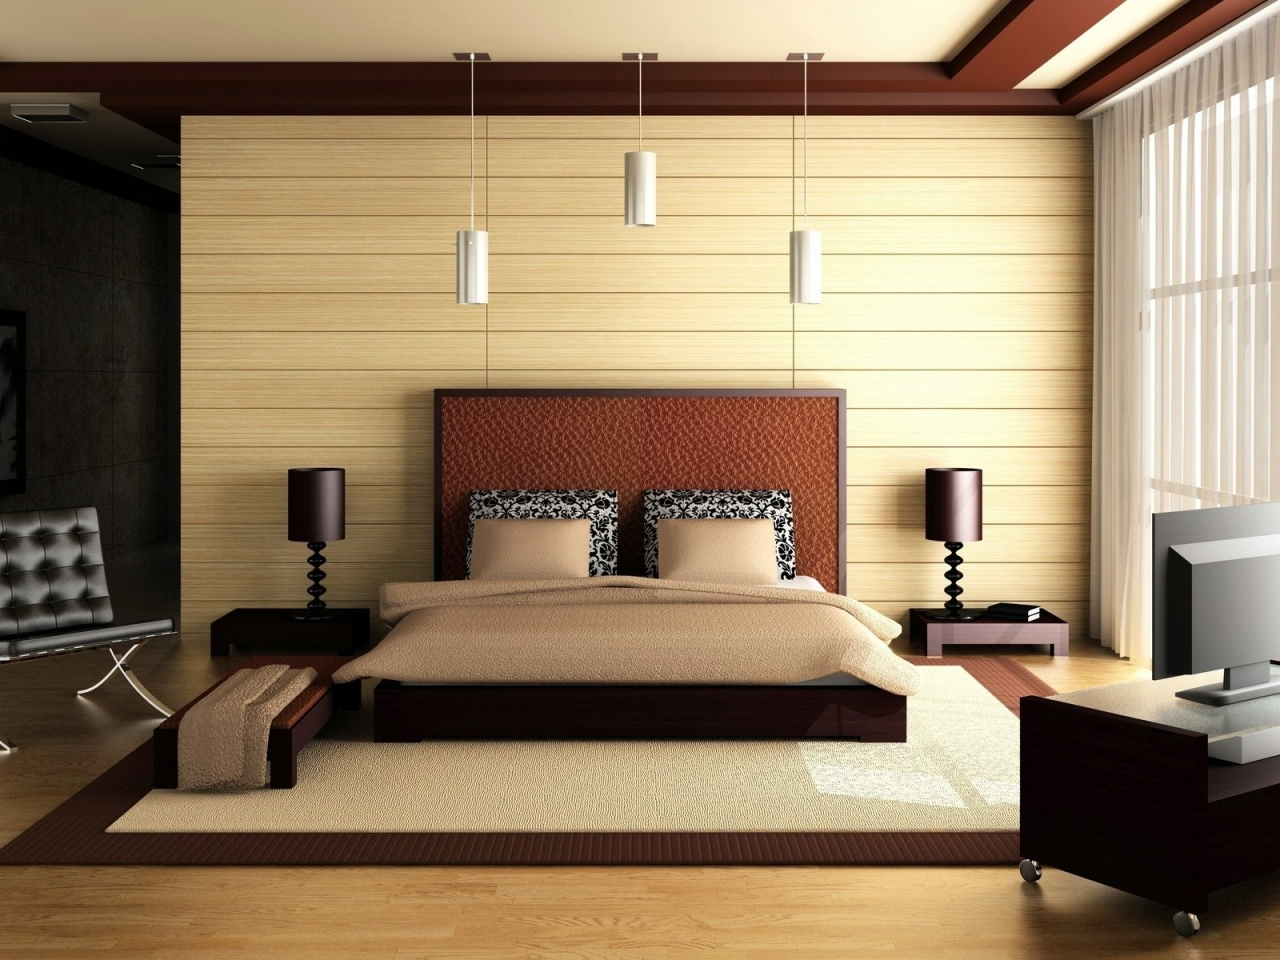 Habitacin Matrimonial 3D Hd 1280x960 Imagenes